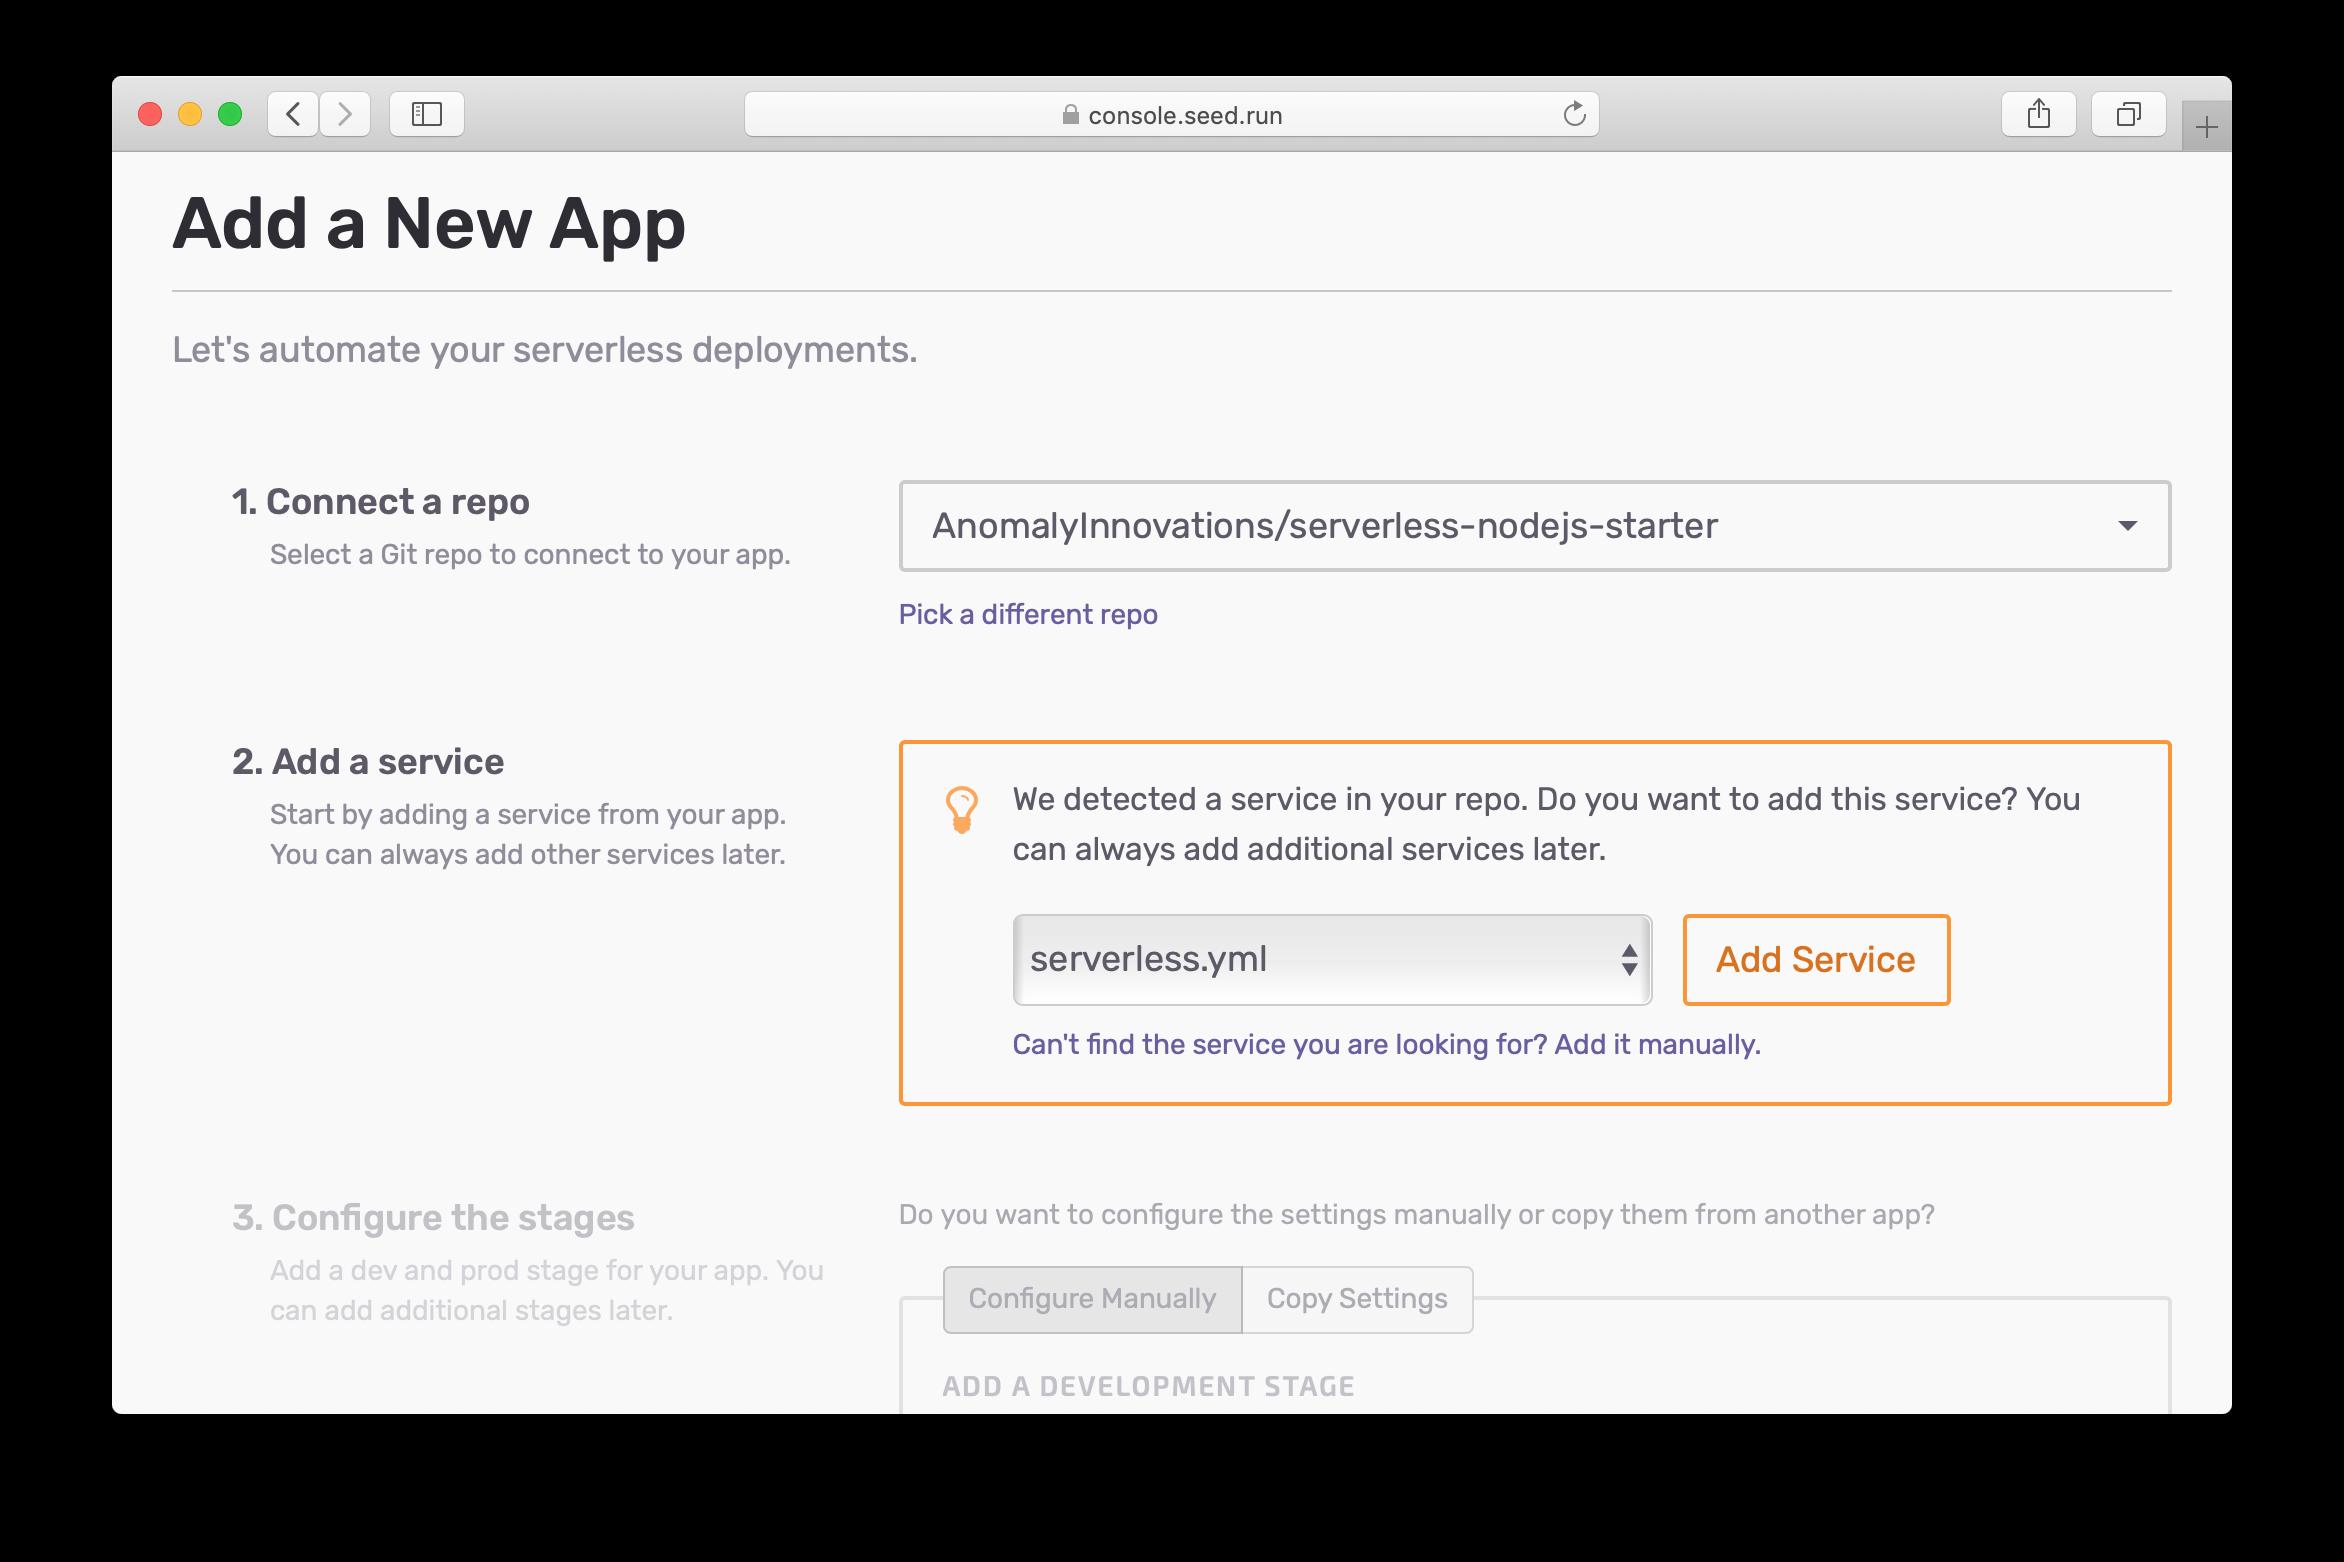 Auto-detect serverless.yml for new app